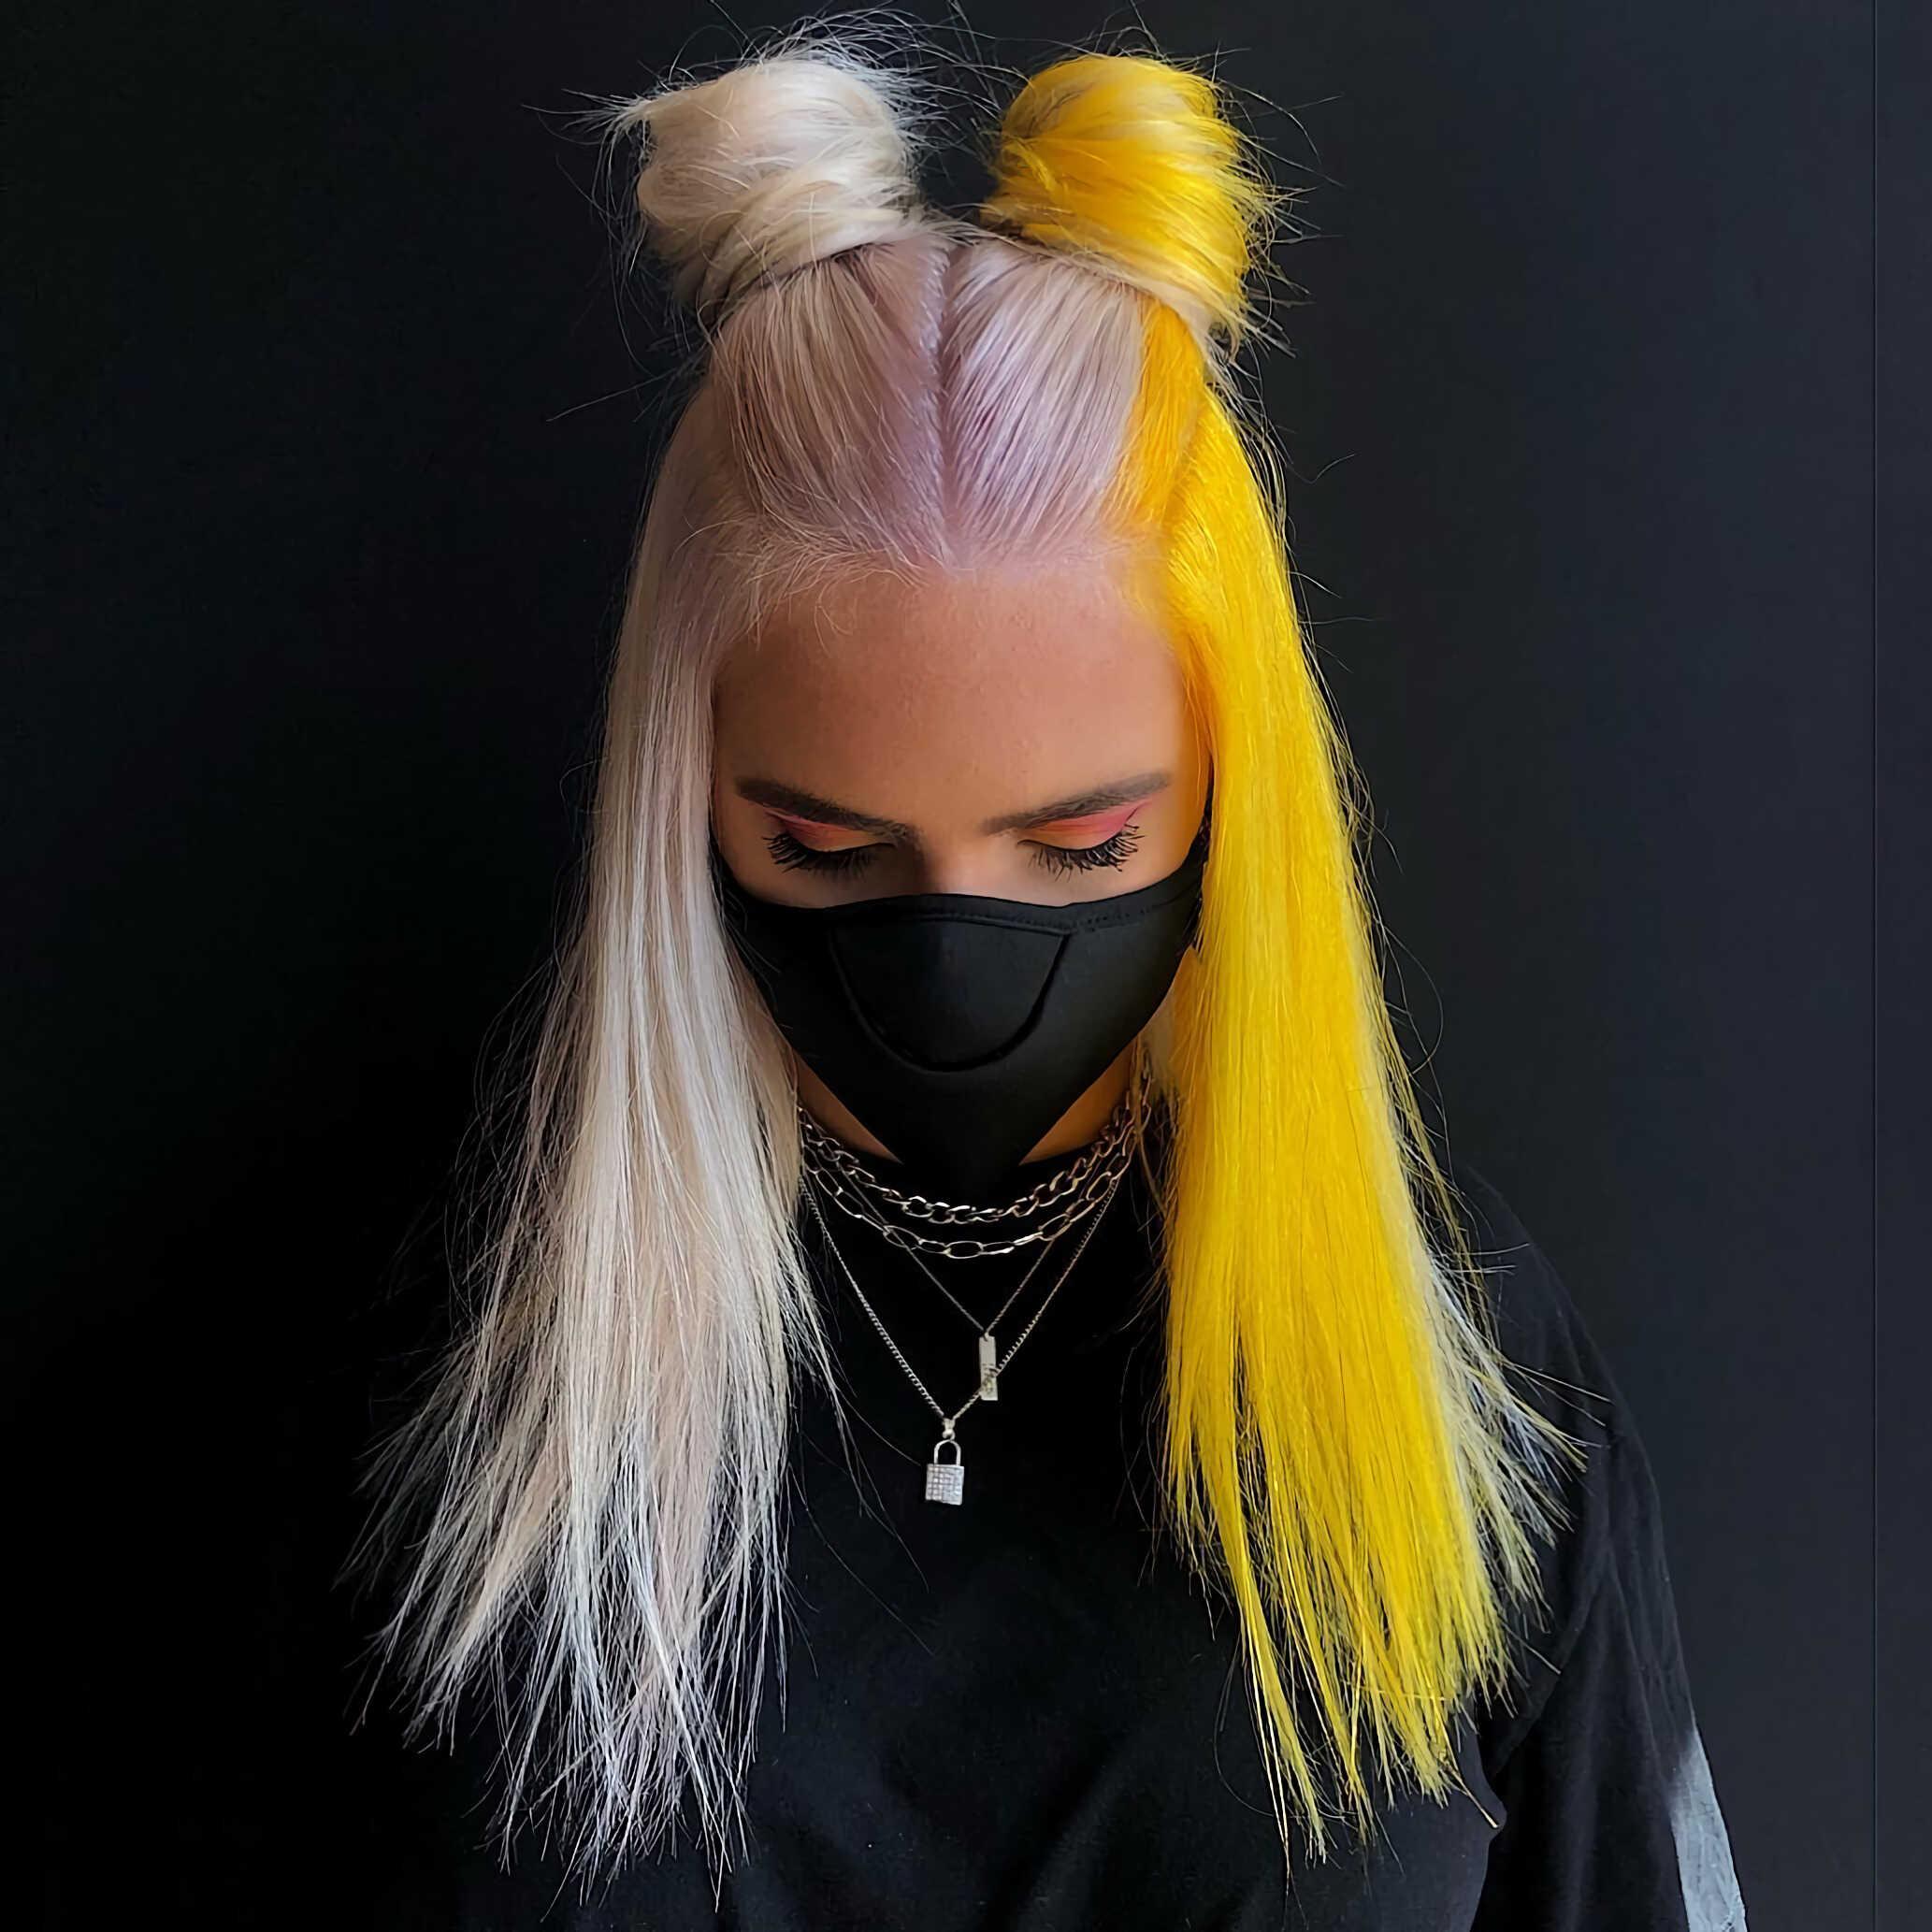 модная прическа в стиле e-girl с двумя оттенками